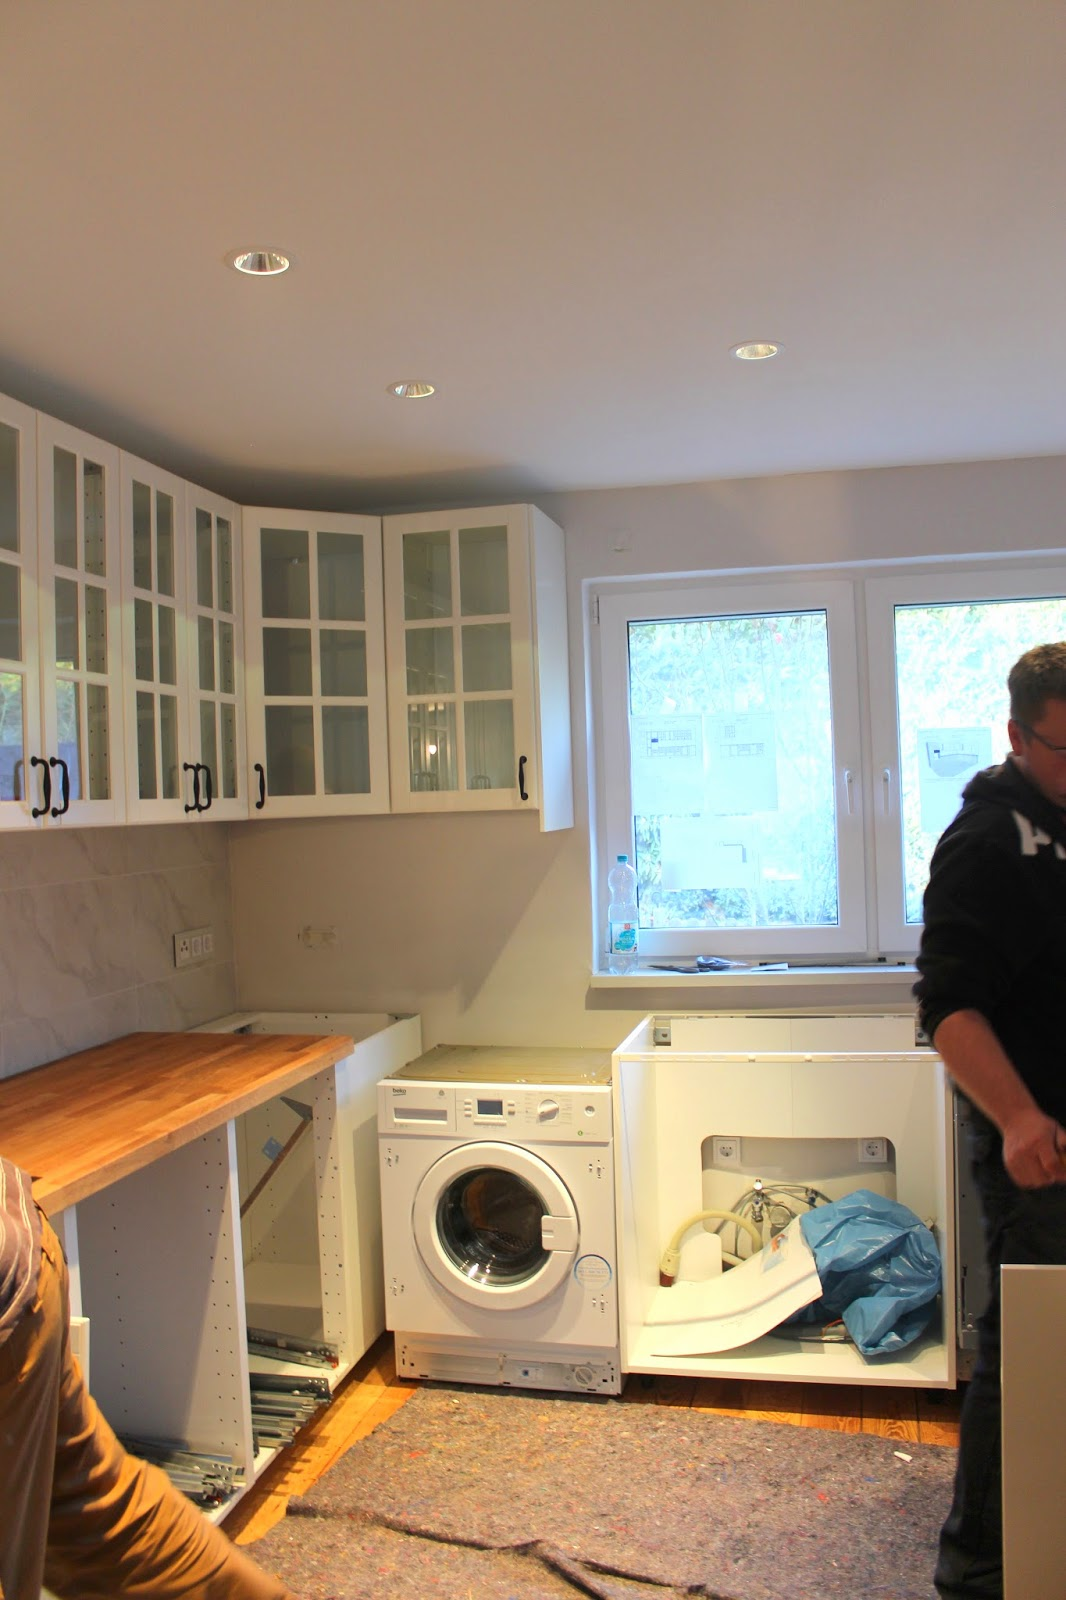 Frau Keks's Welt: Die Küche kommt! - Hausbau mit Hindernissen